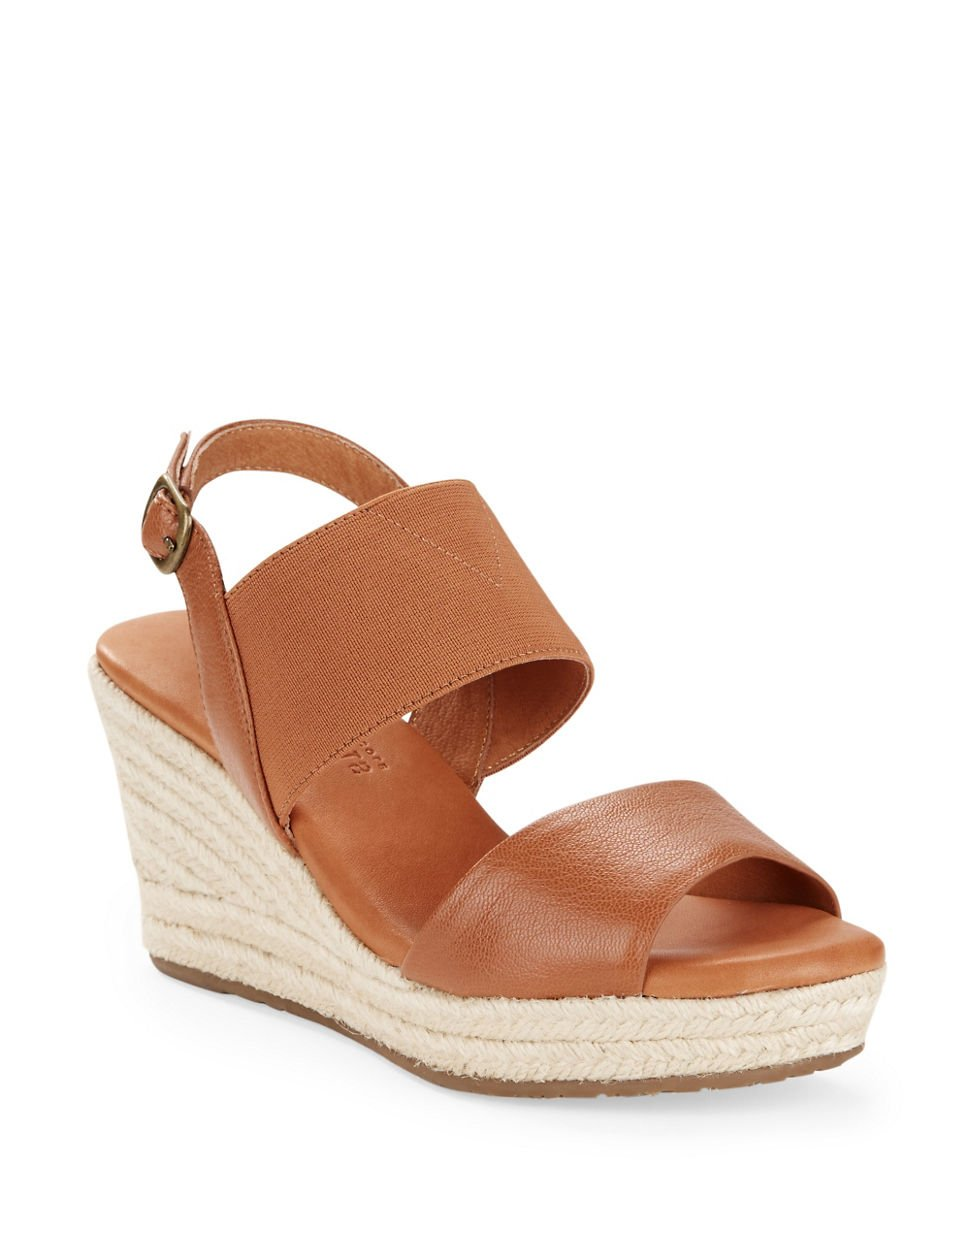 gentle souls kara leather espadrille wedge sandals in